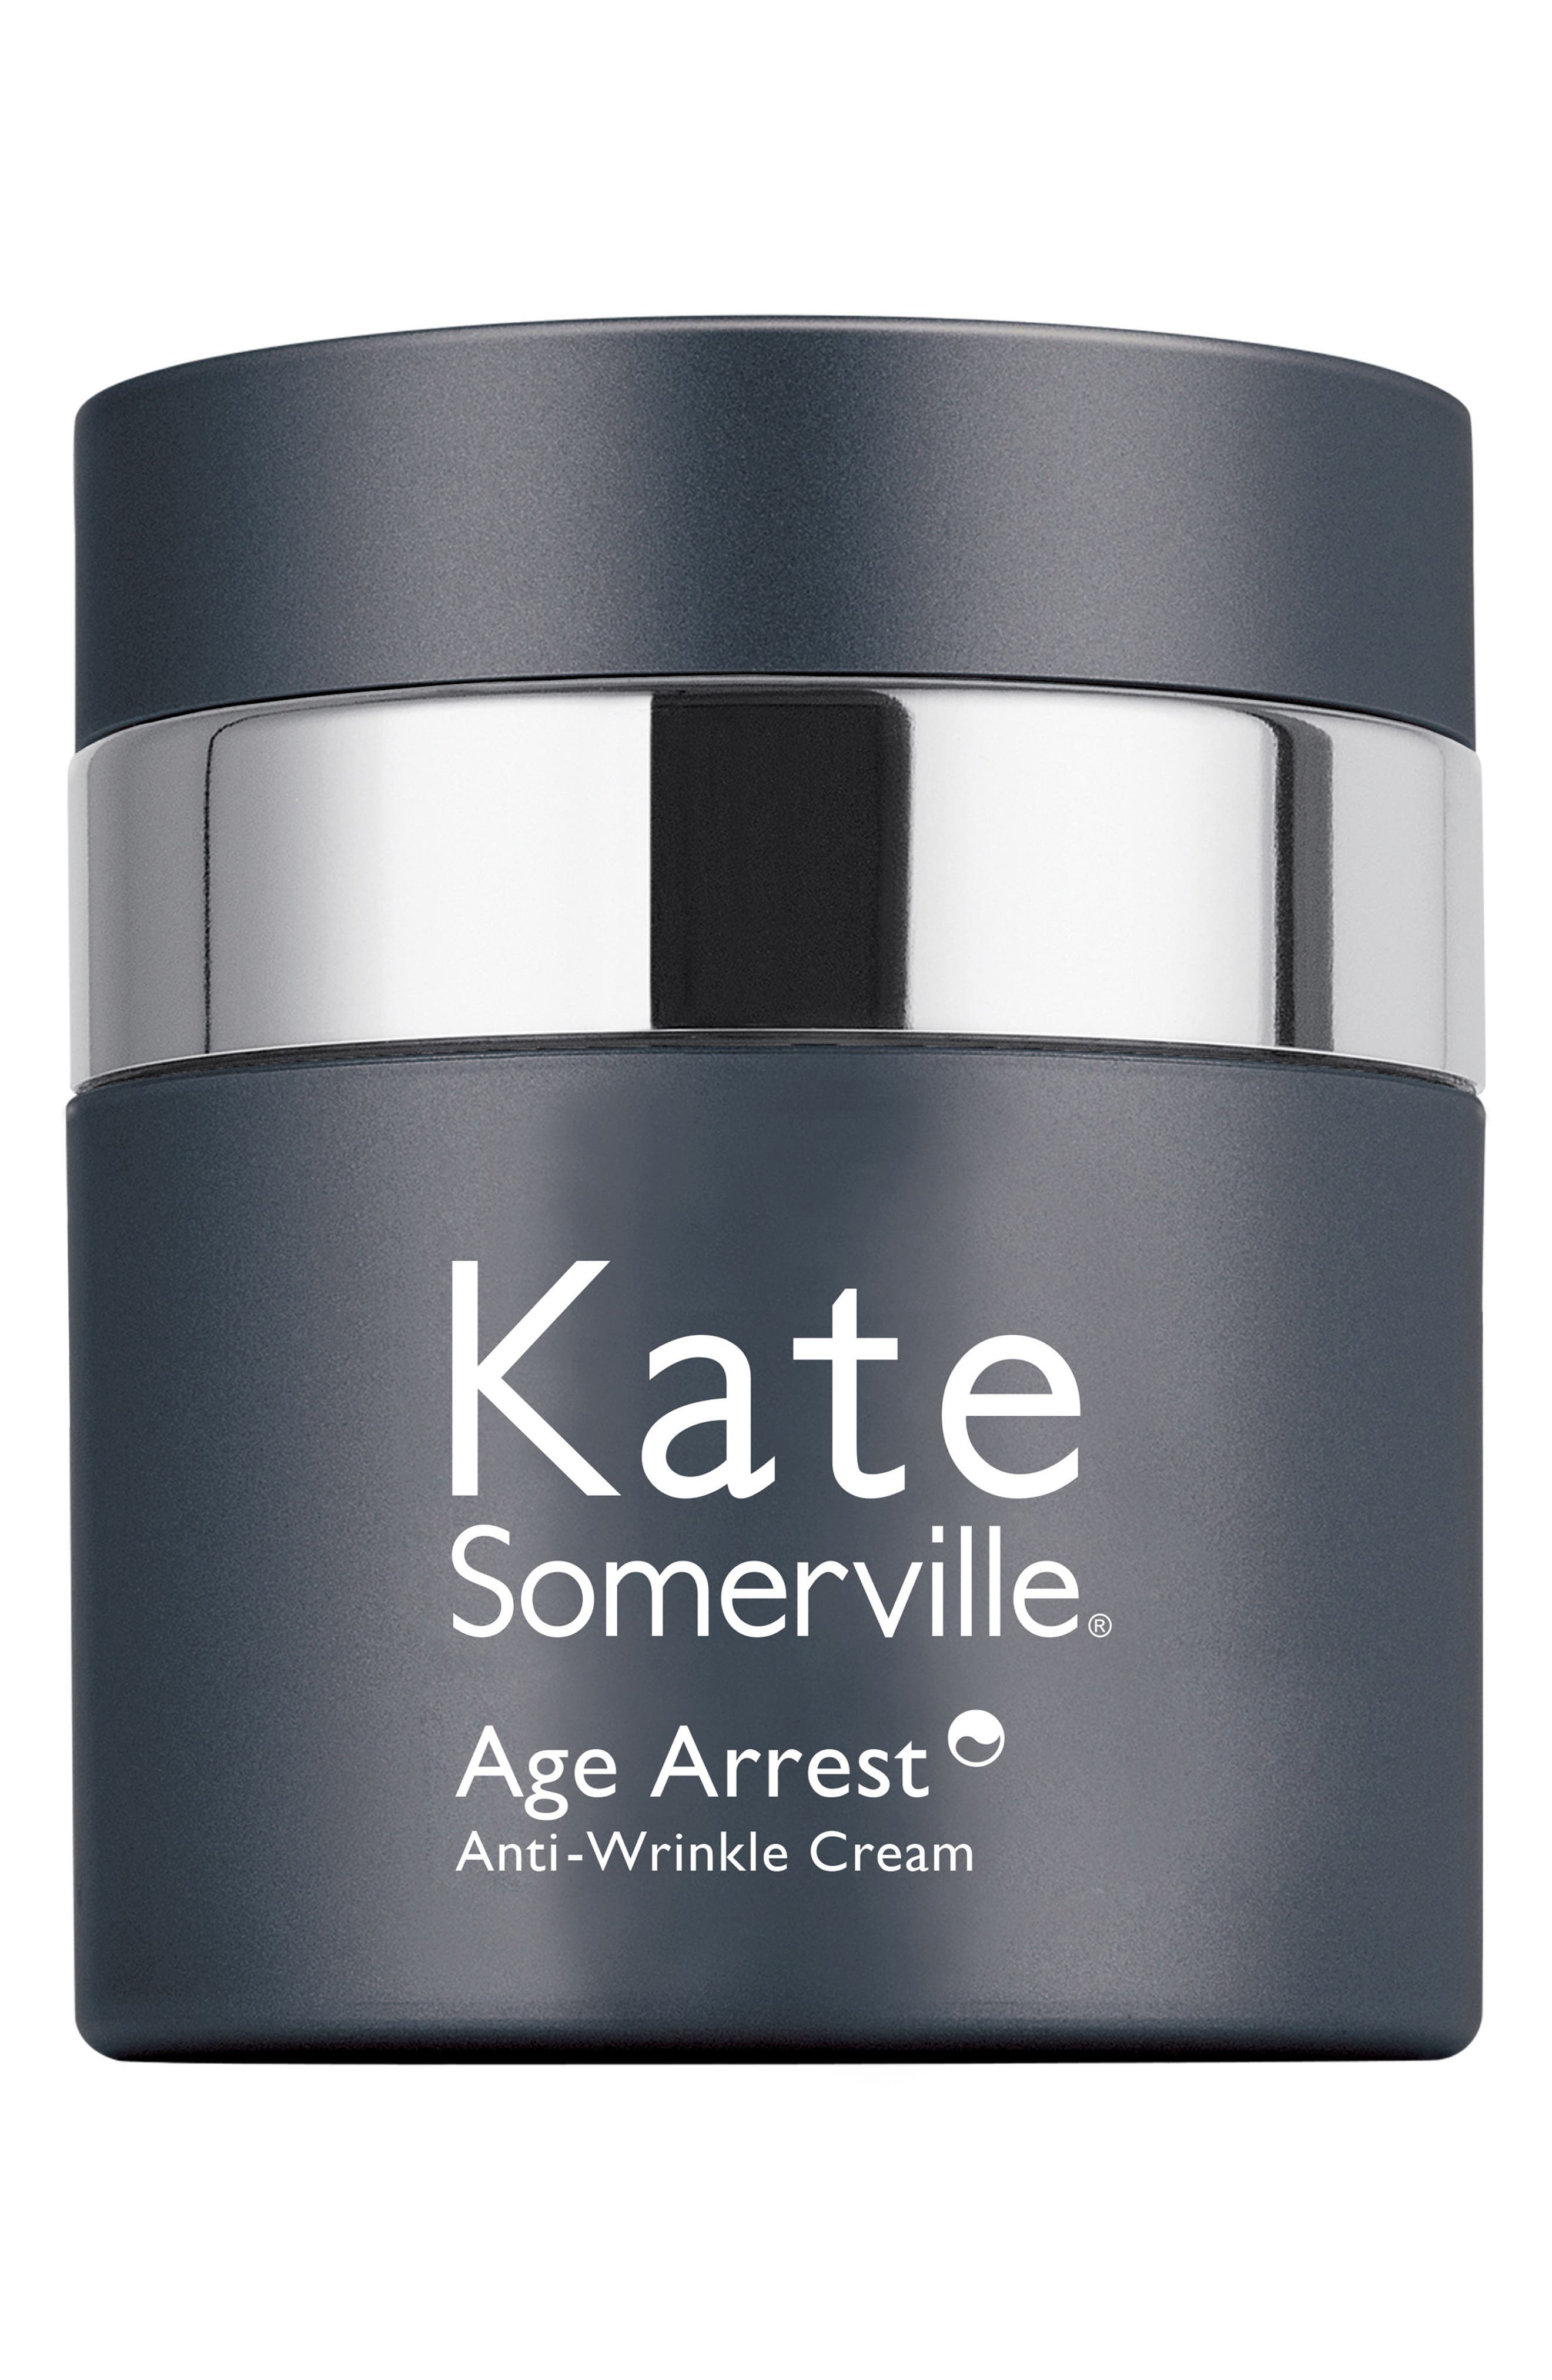 Kate Somerville® 'Age Arrest' Wrinkle Reducing Cream